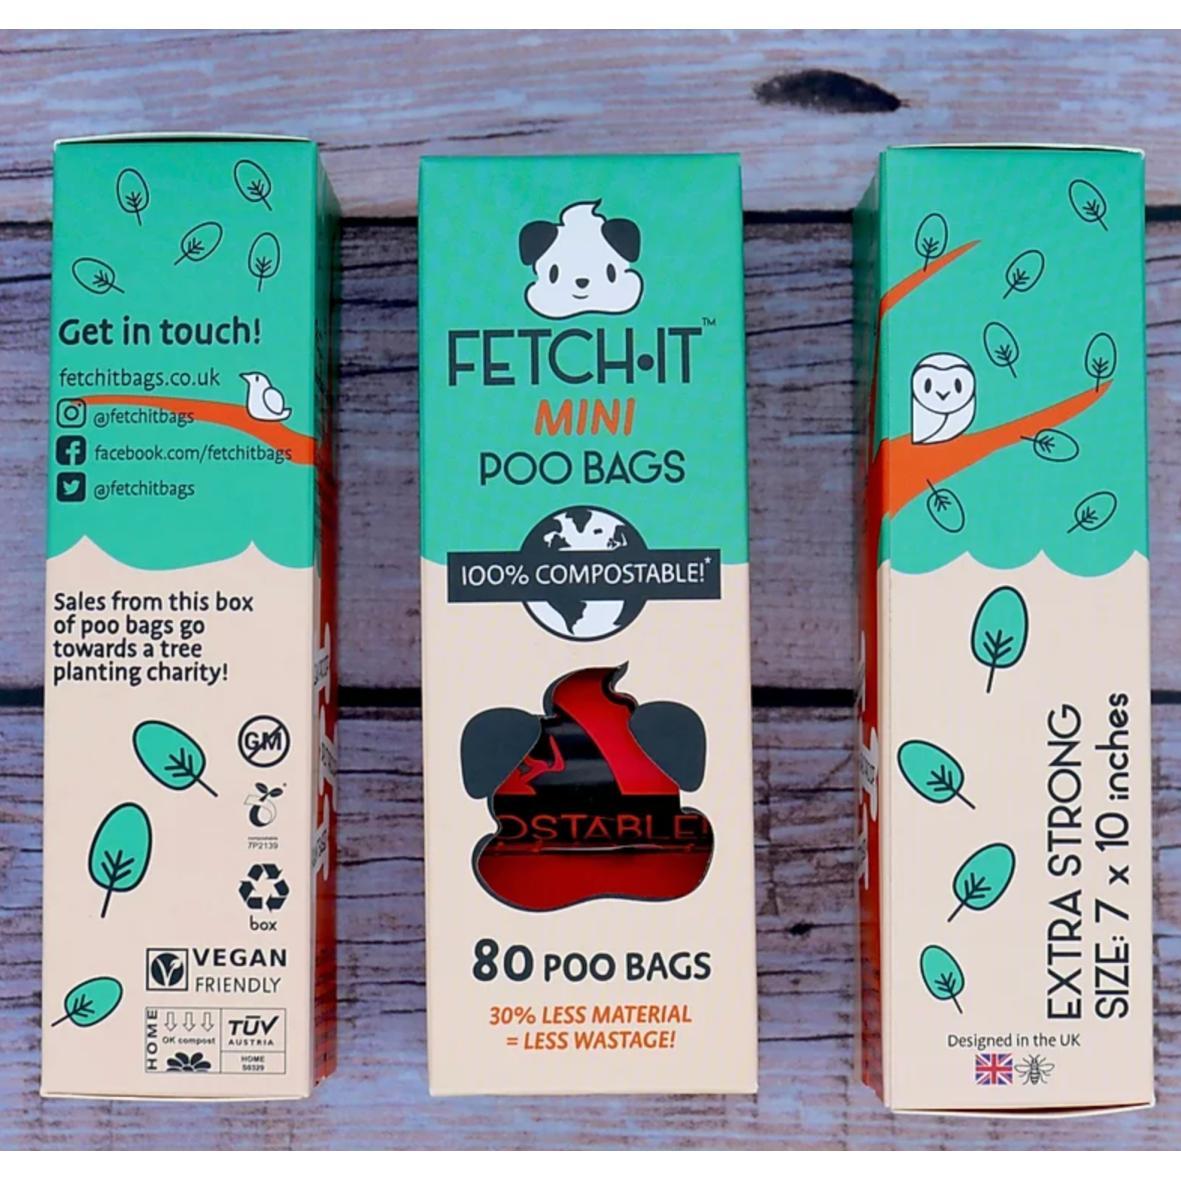 FETCHIT Mini Poo Bags 80pcs (100% Compostable)